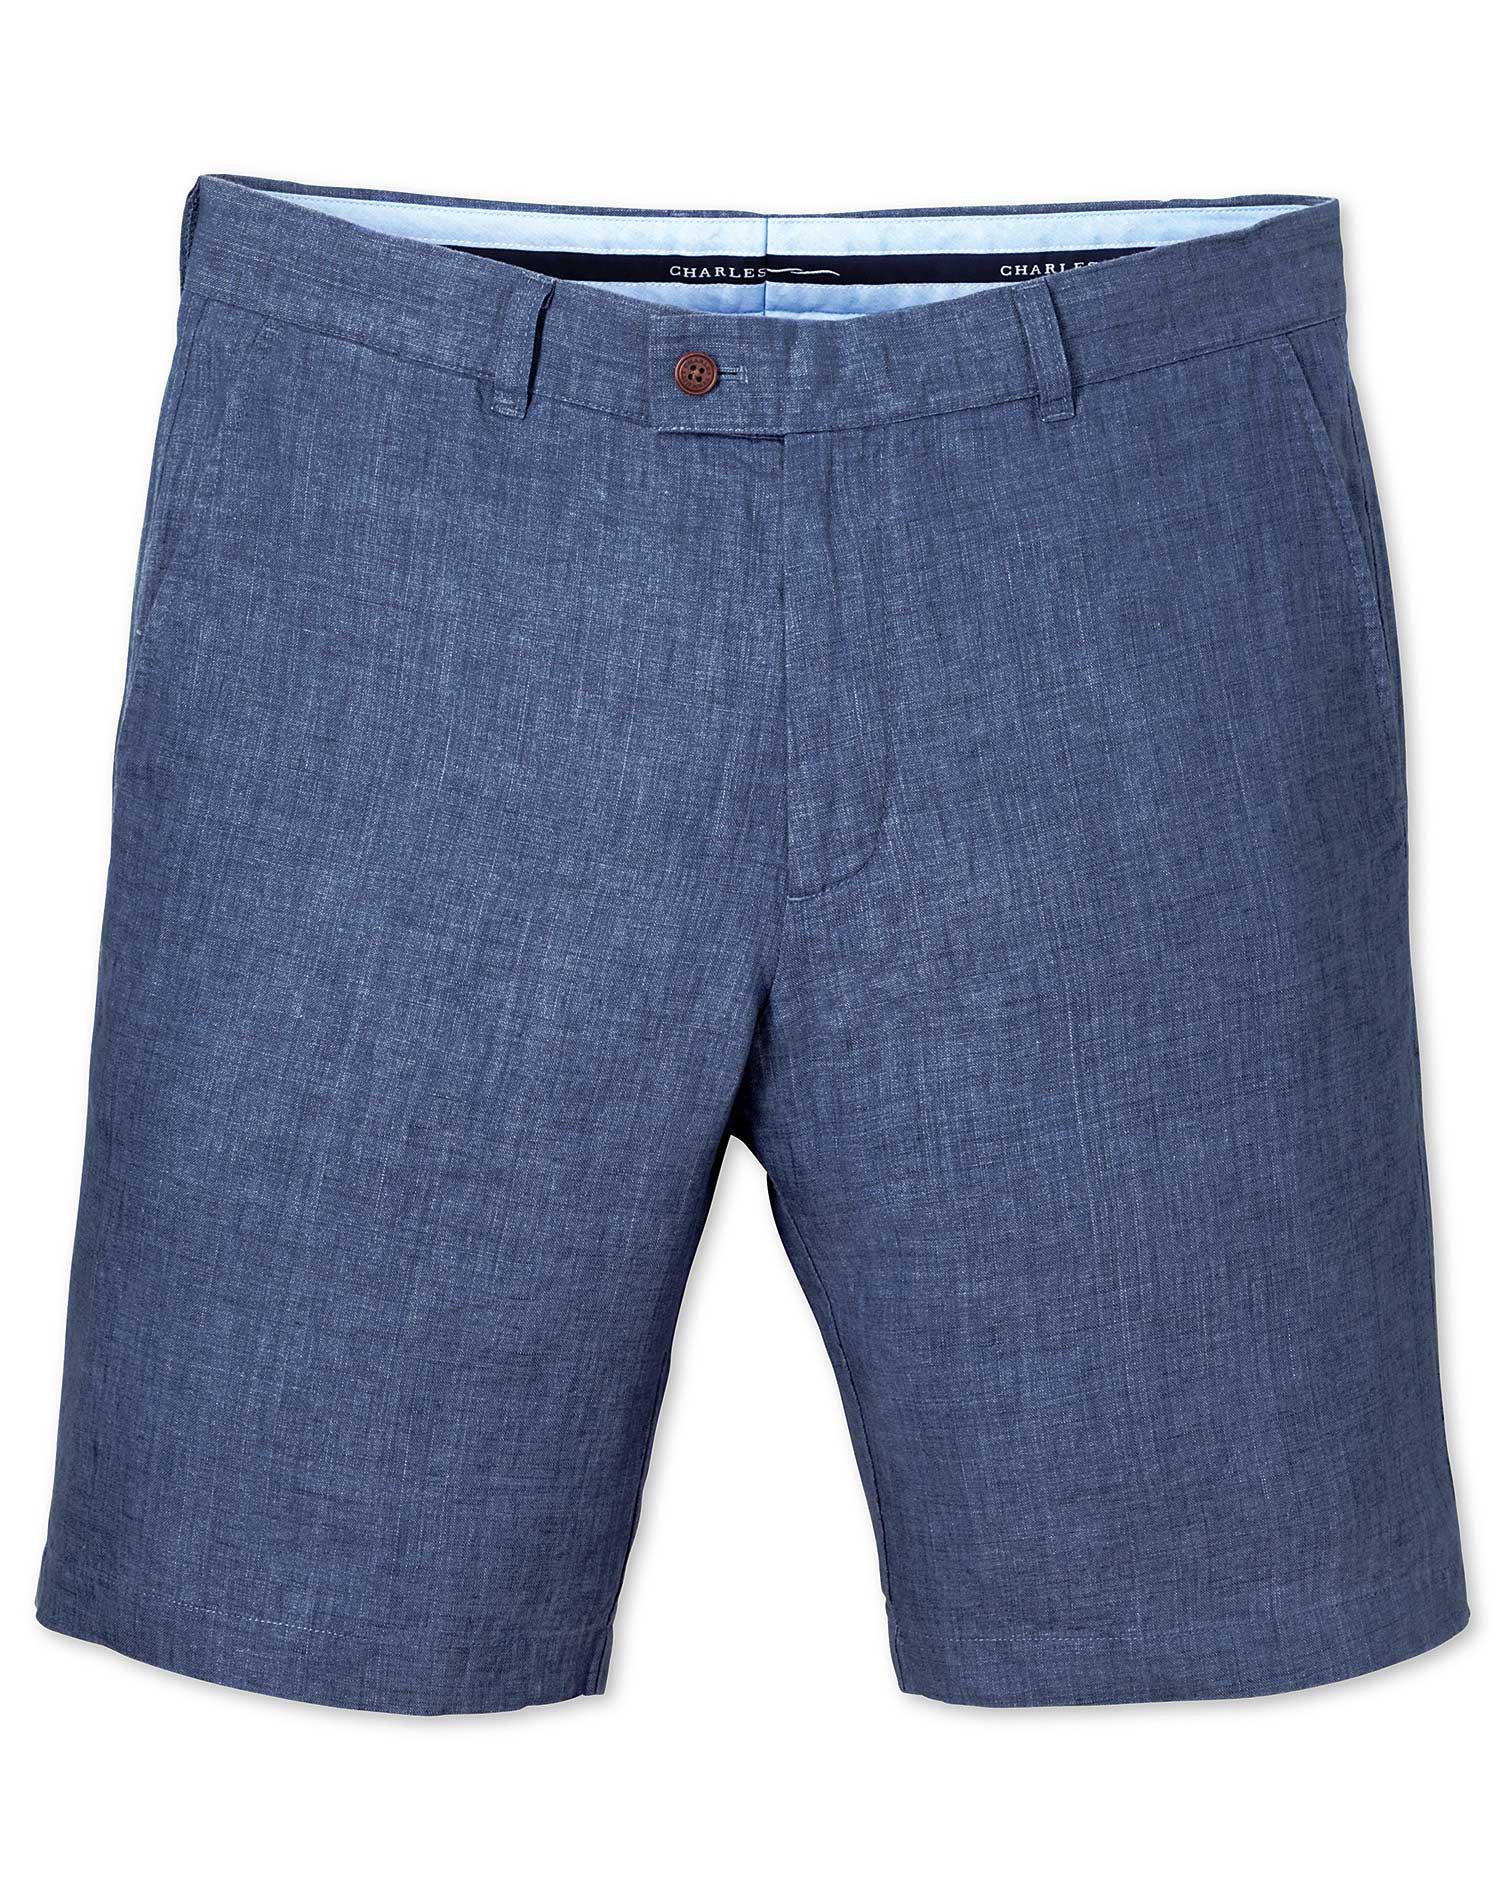 Blue Slim Fit Linen Shorts Size 40 by Charles Tyrwhitt